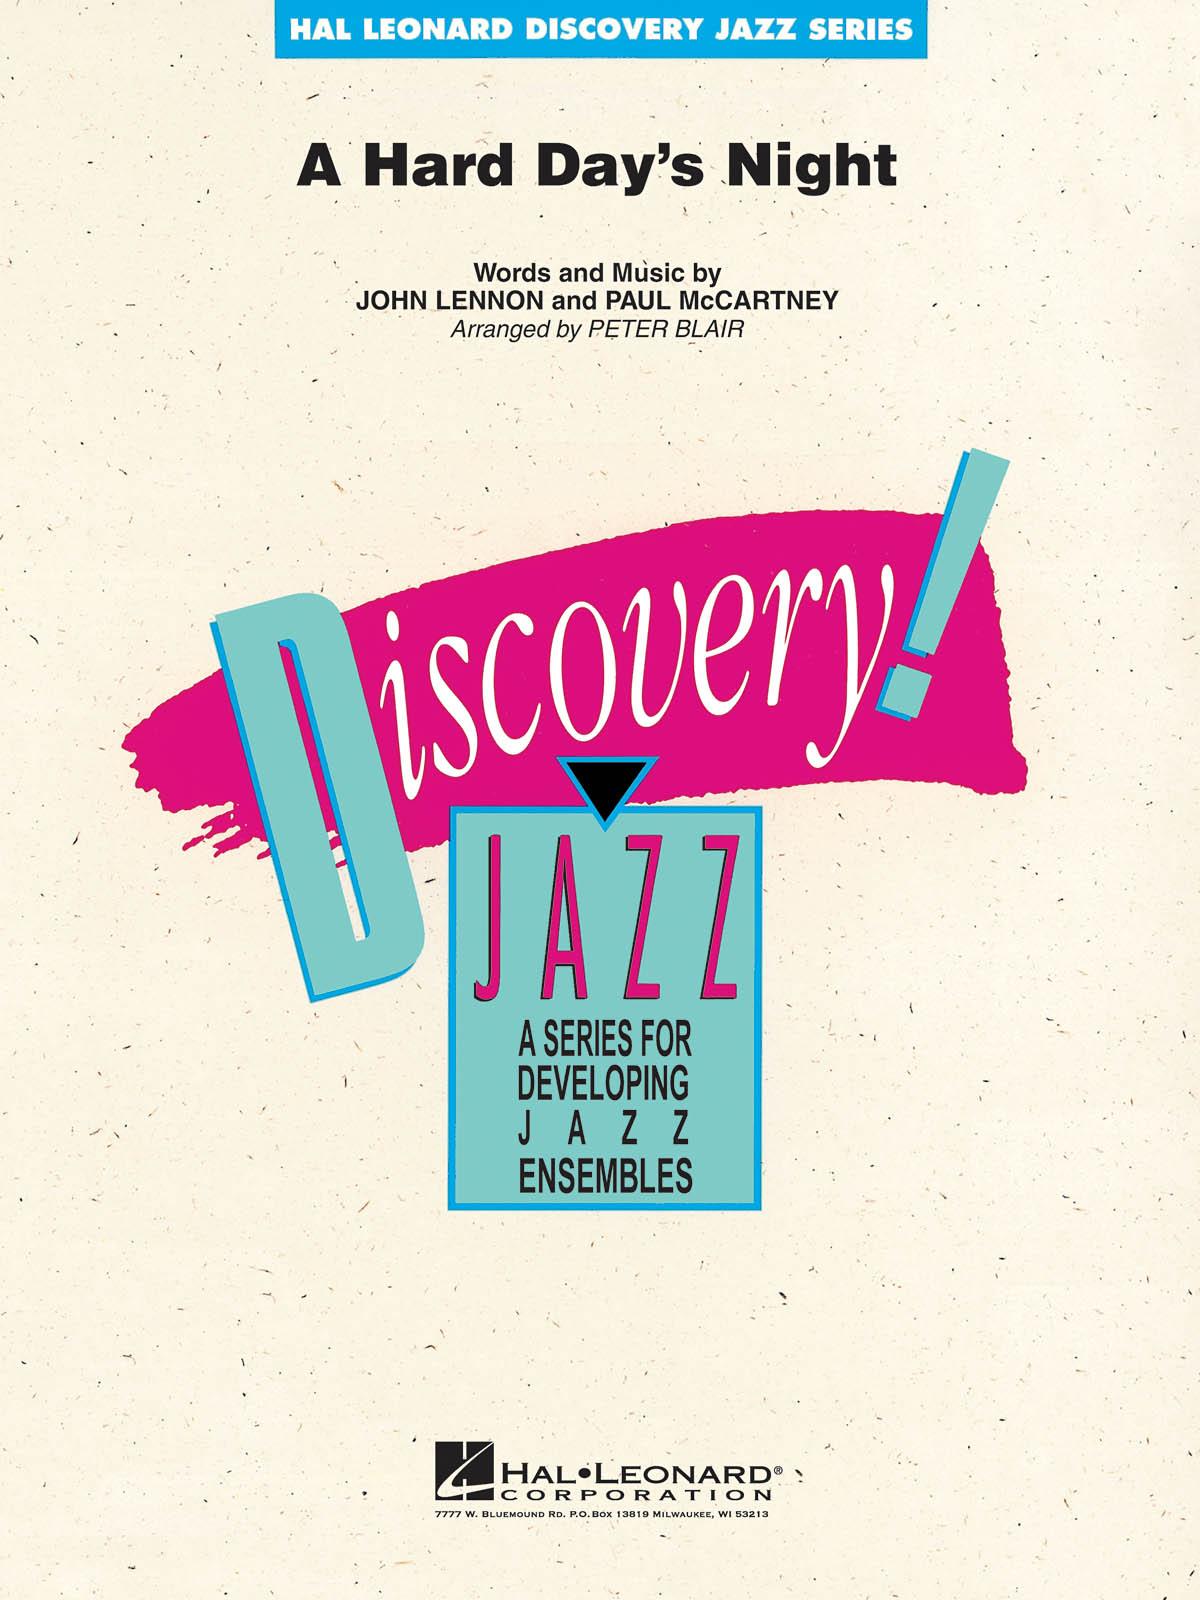 A Hard Day's Night: Discovery Jazz